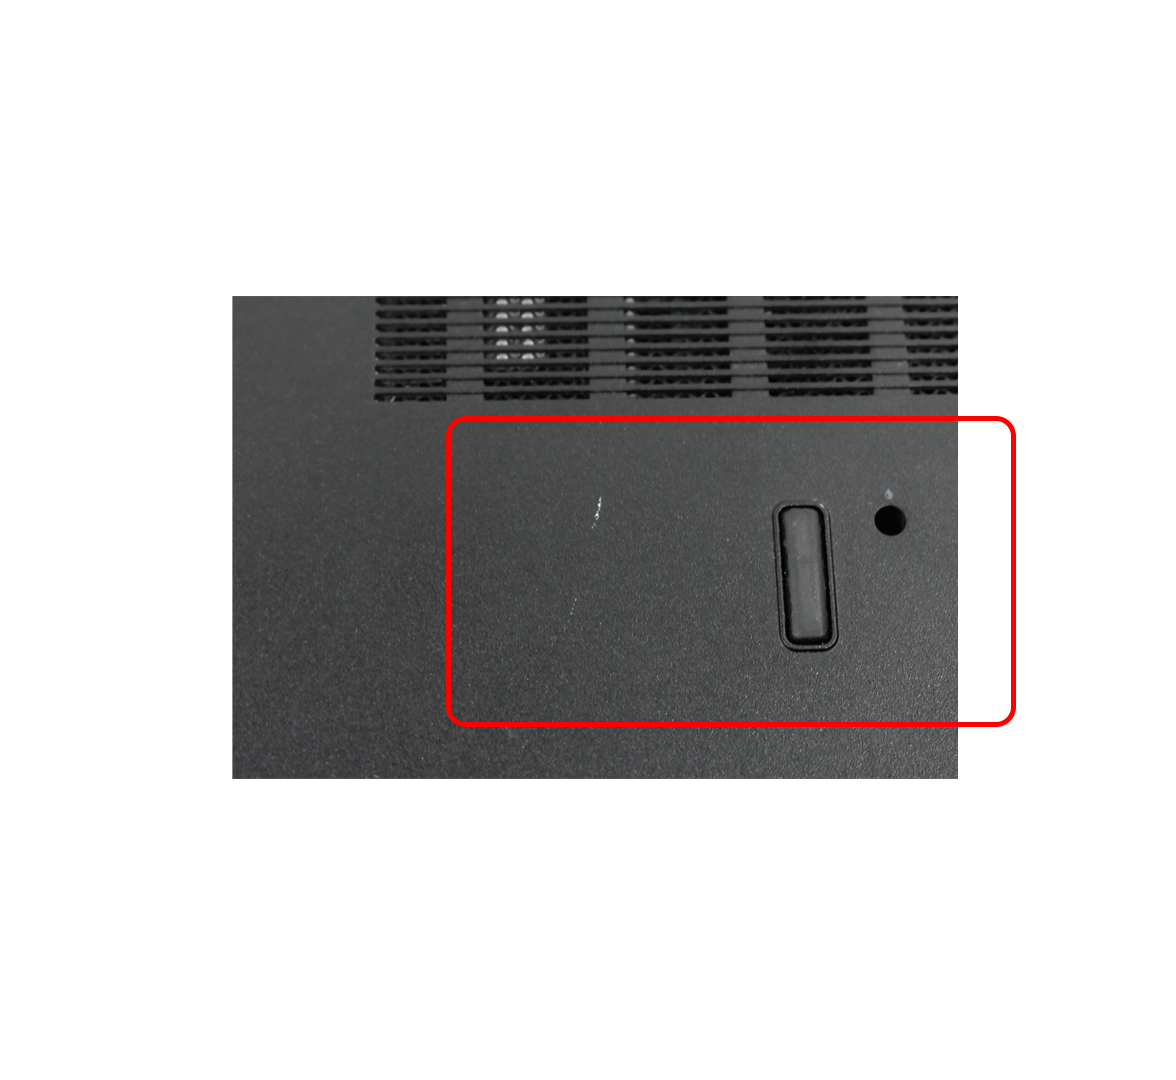 Dell Latitude E6430s Business Laptop, Intel Core i5-3380M CPU, 8GB DDR3L SODIMM RAM, 256GB SSD 2.5, 14 inch Display, Windows 10 (Refurbished)